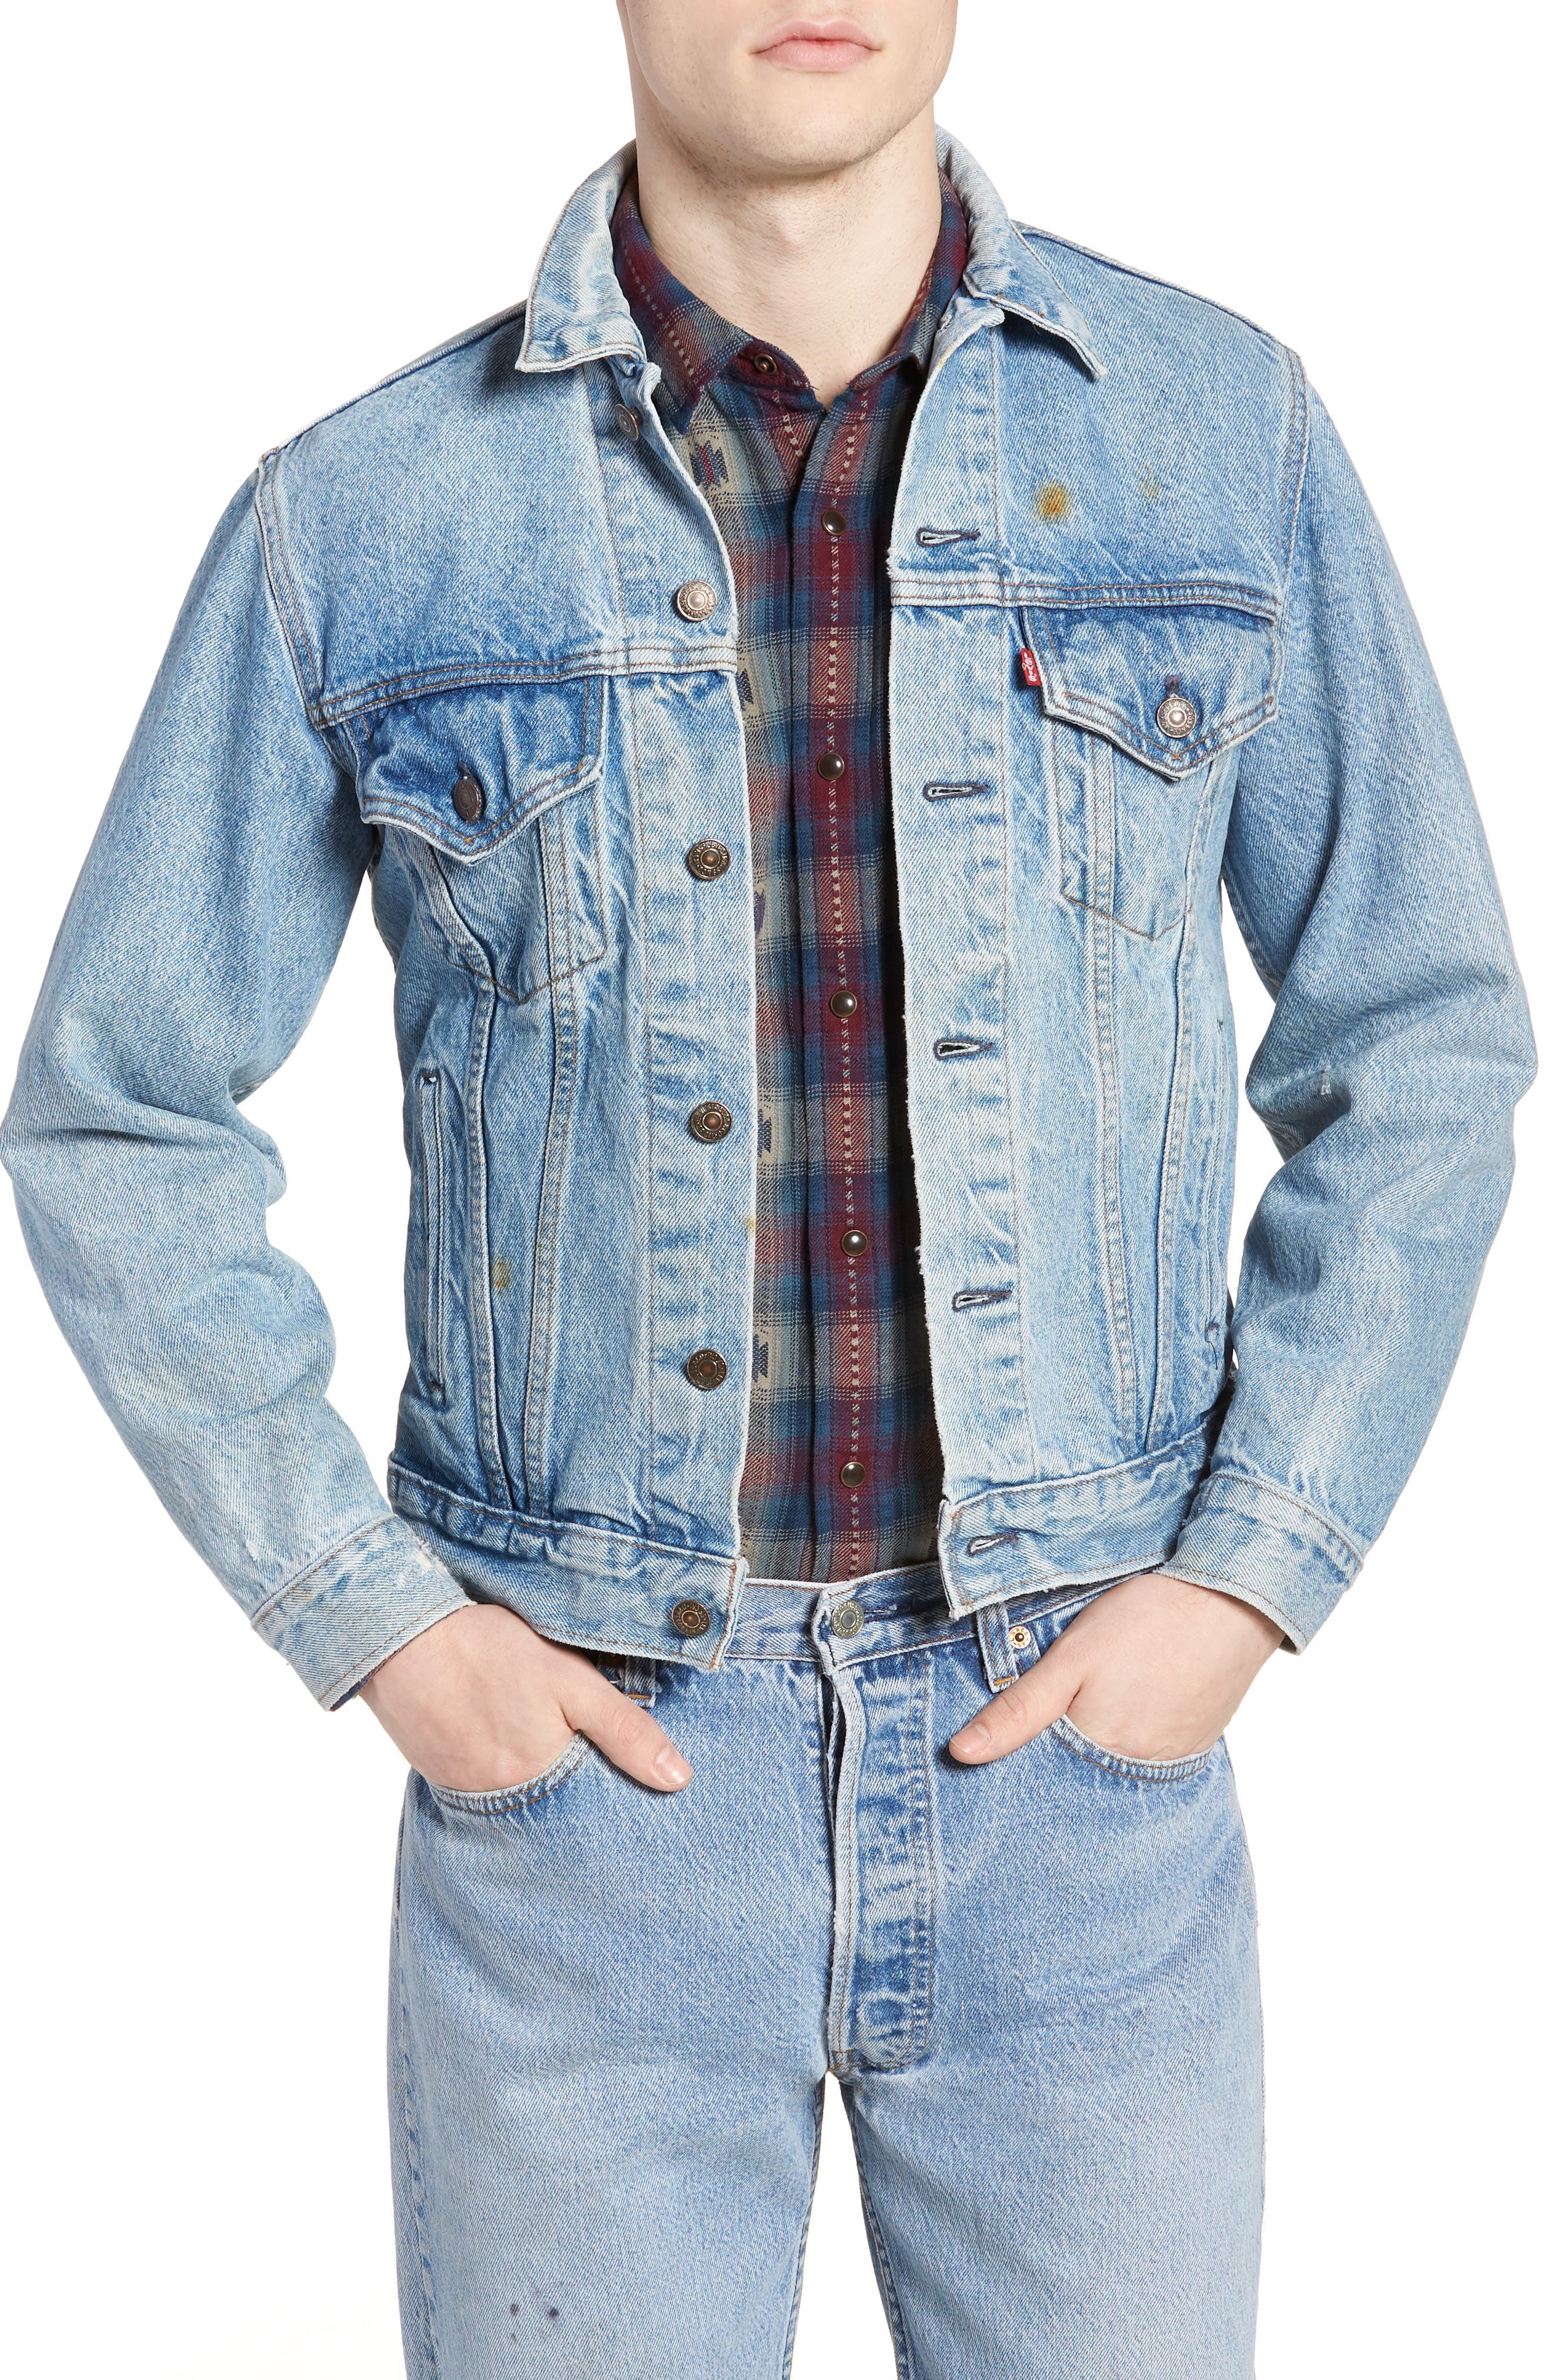 Authorized Vintage Trucker Jacket,                         Main,                         color, Av Blue